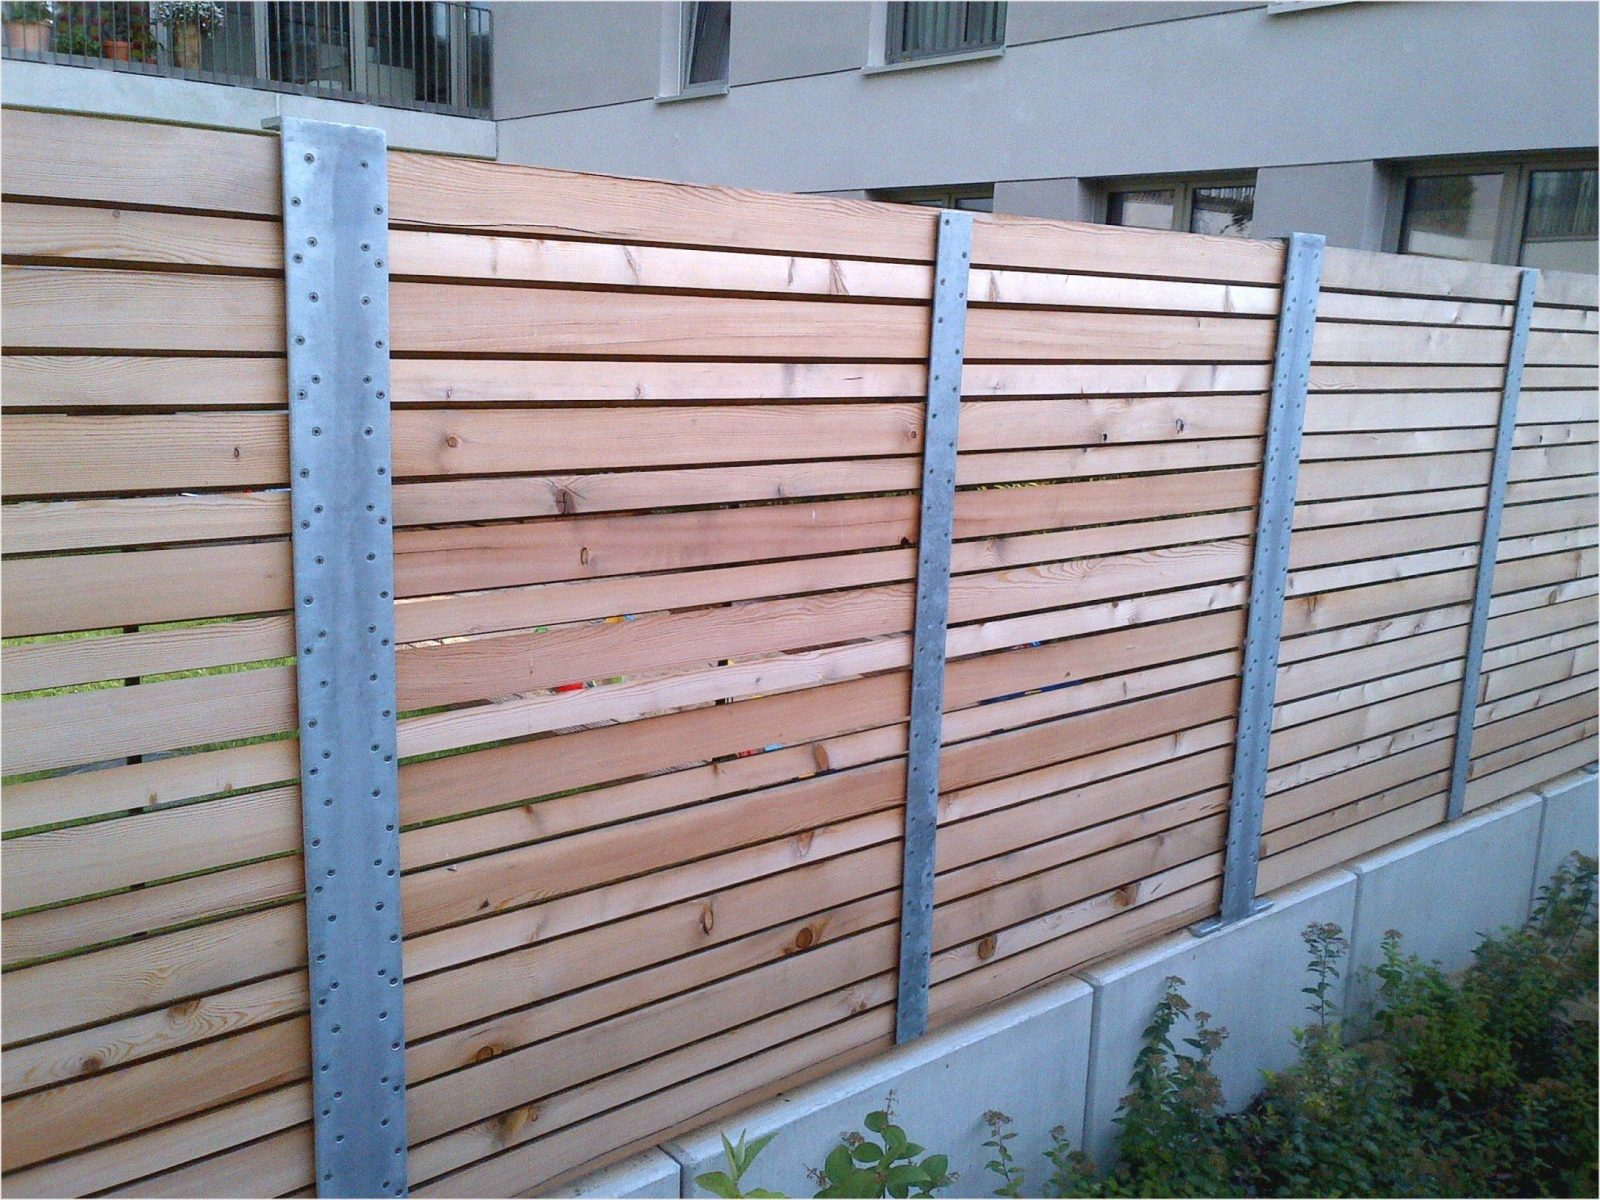 Moderne Gartenzaun Sichtschutz  Neu Gartenzaun Holz Sichtschutz von Sichtschutz Selber Bauen Holz Photo